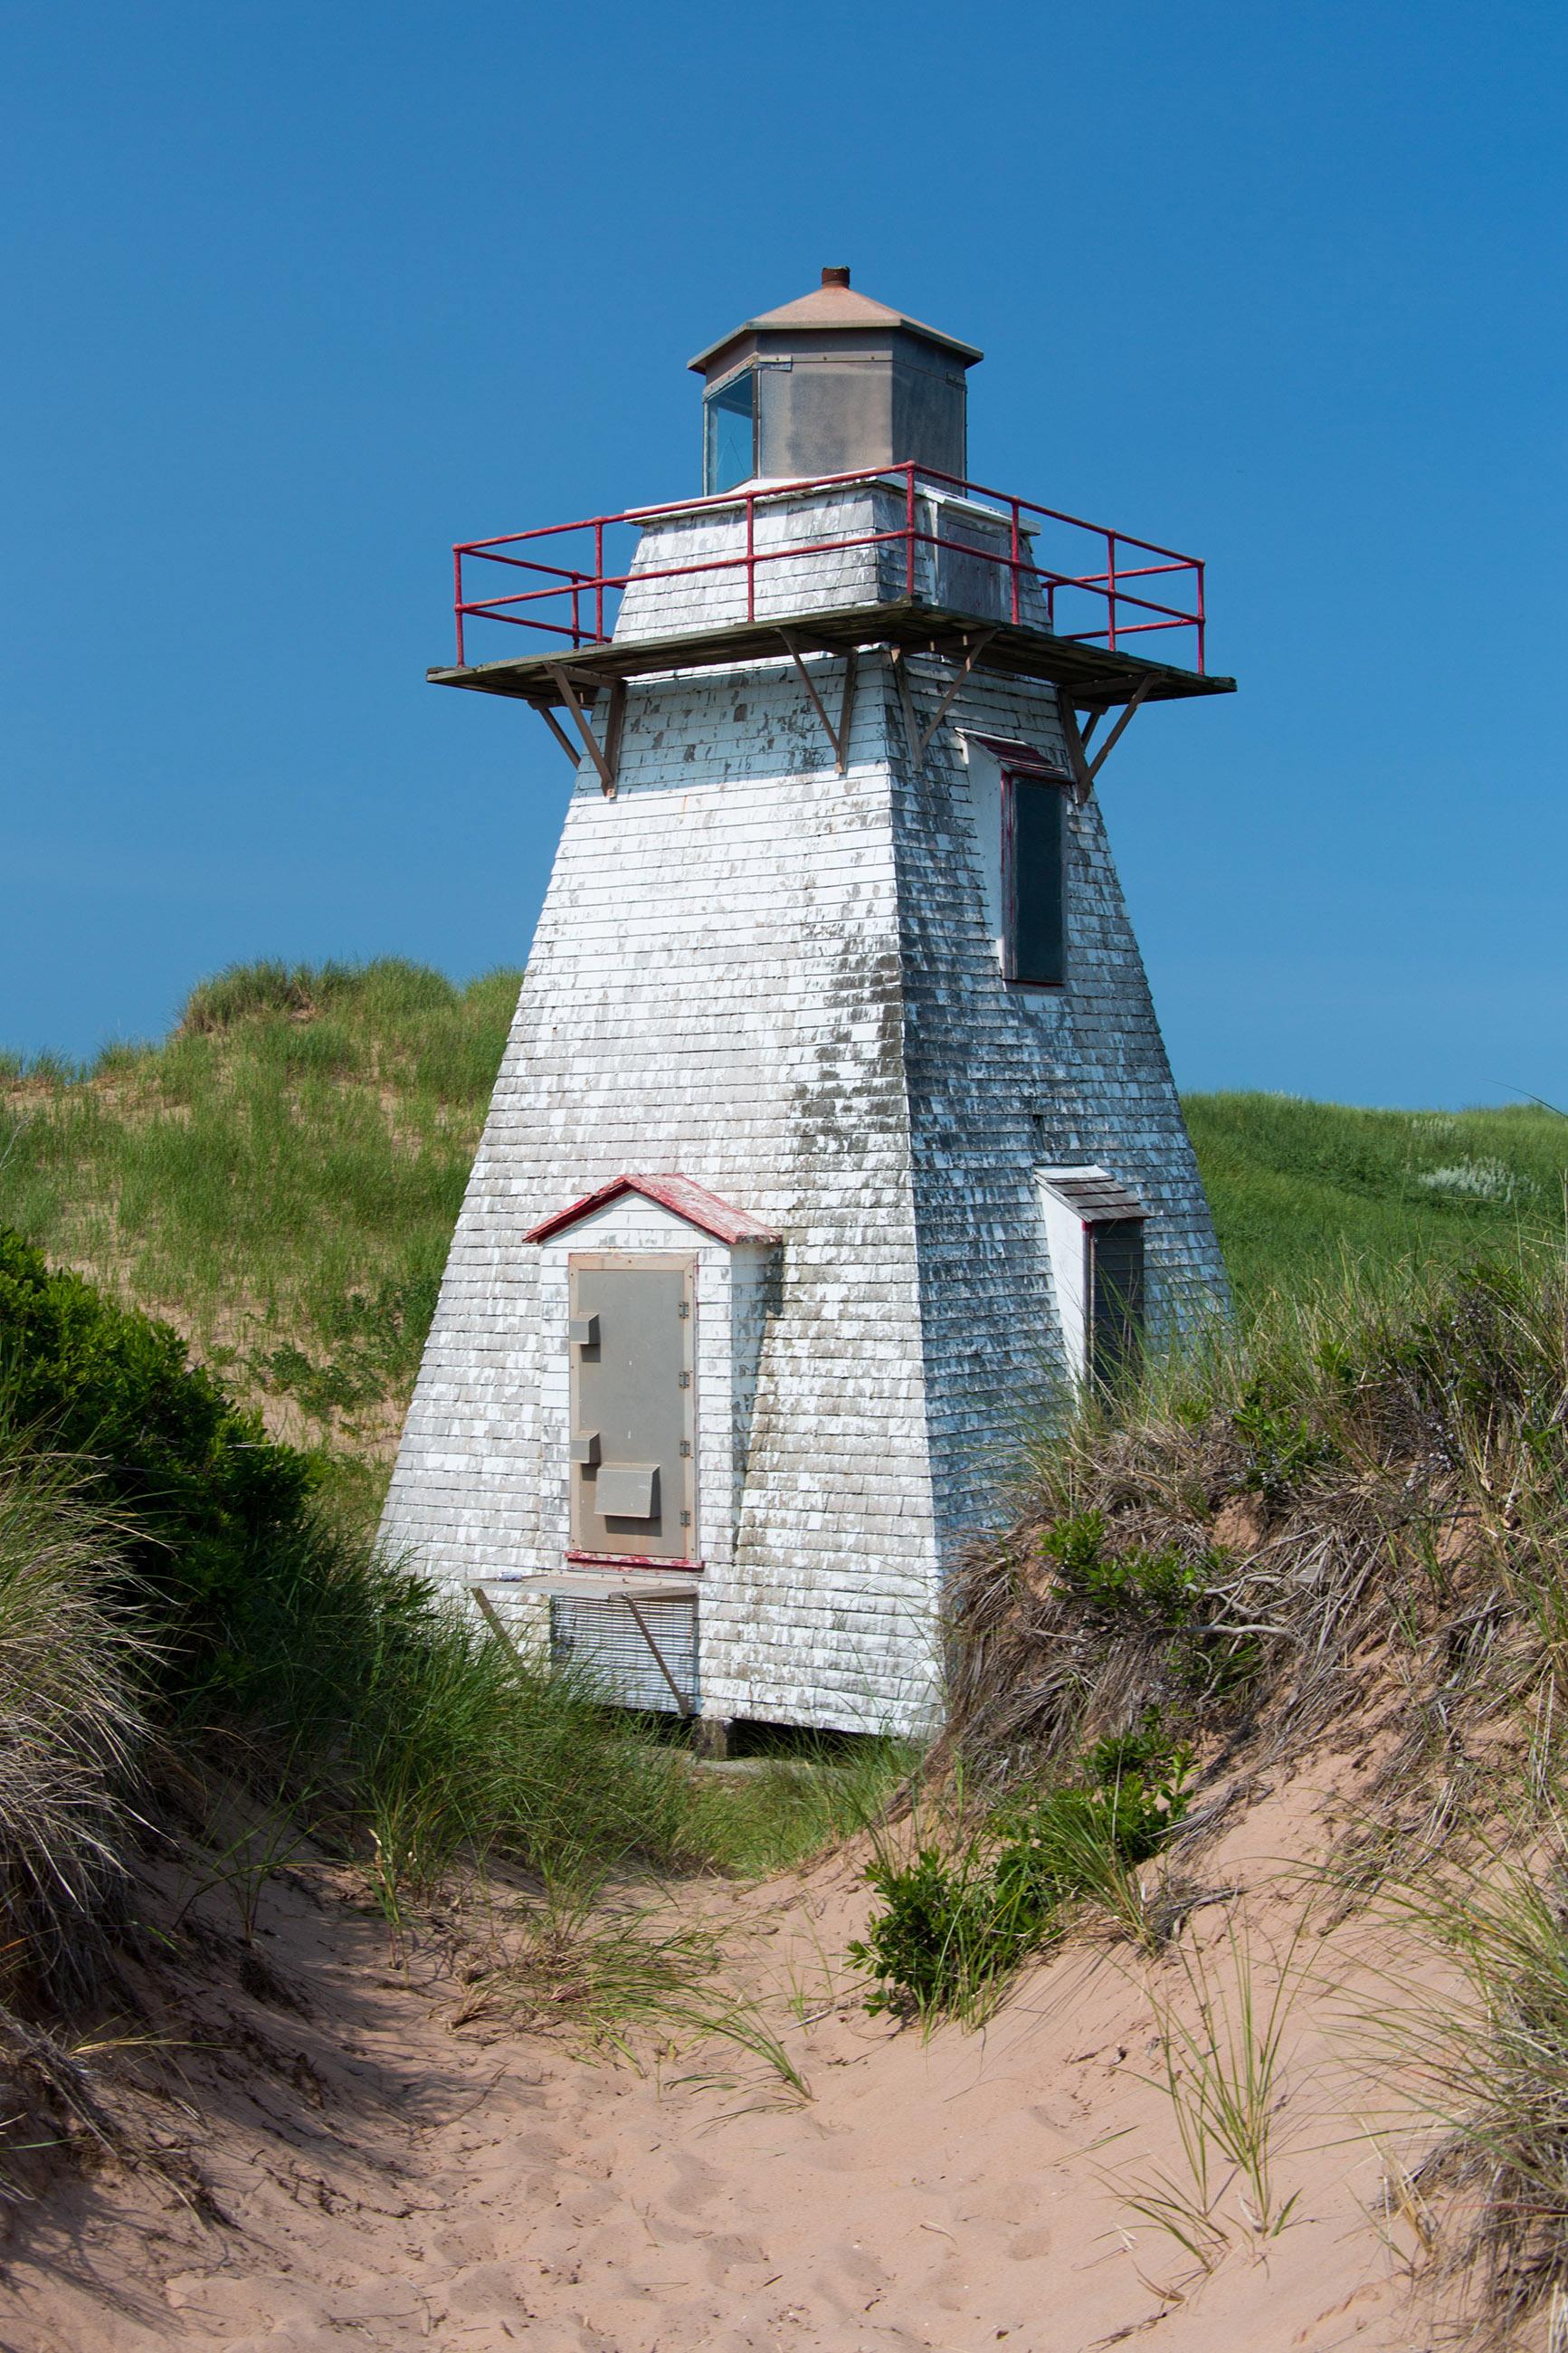 Lighthouse, Atlantic, Redwhite, Navigation, Ocean, HQ Photo